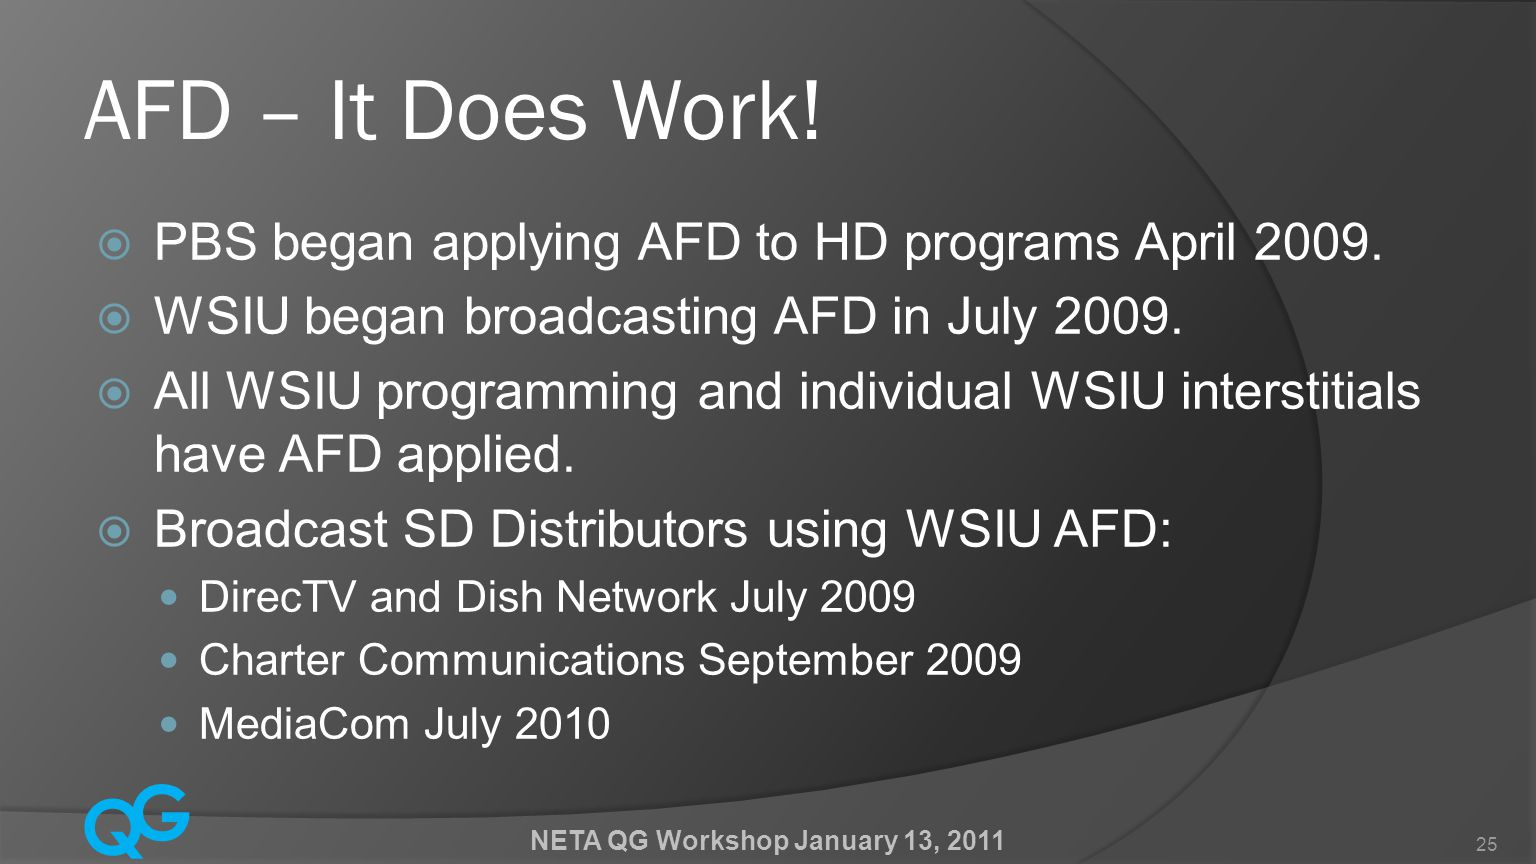 Q G NETA QG Workshop January 13, 2011 25 AFD – It Does Work!  PBS began applying AFD to HD programs April 2009.  WSIU began broadcasting AFD in July